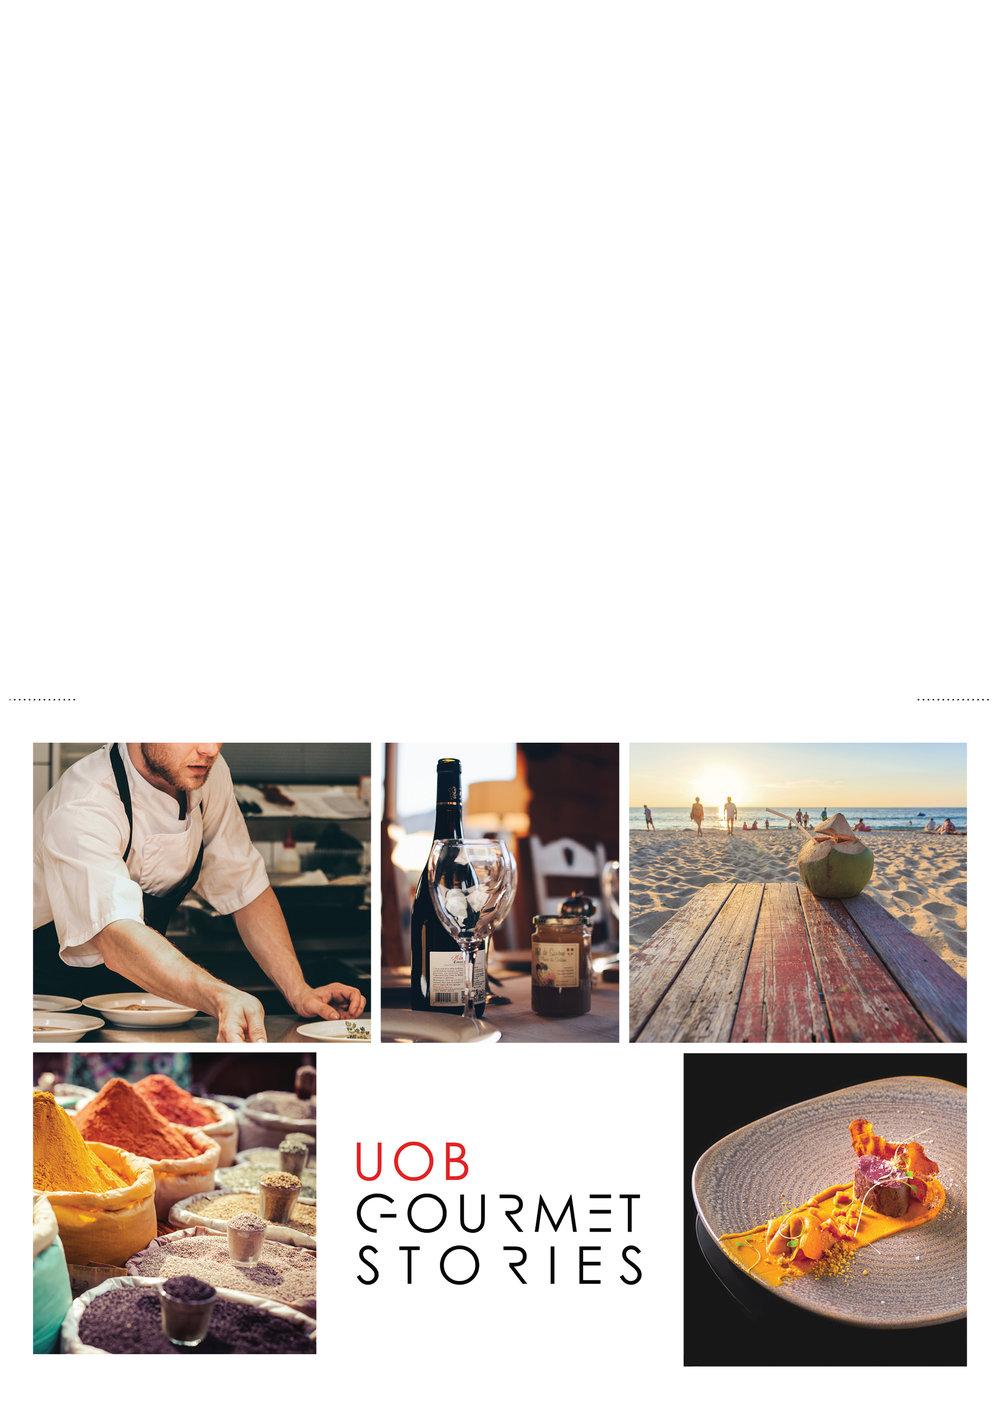 UGS-APRIL-MENU-dinner_Lunch-TAKADA-D1-3.jpg